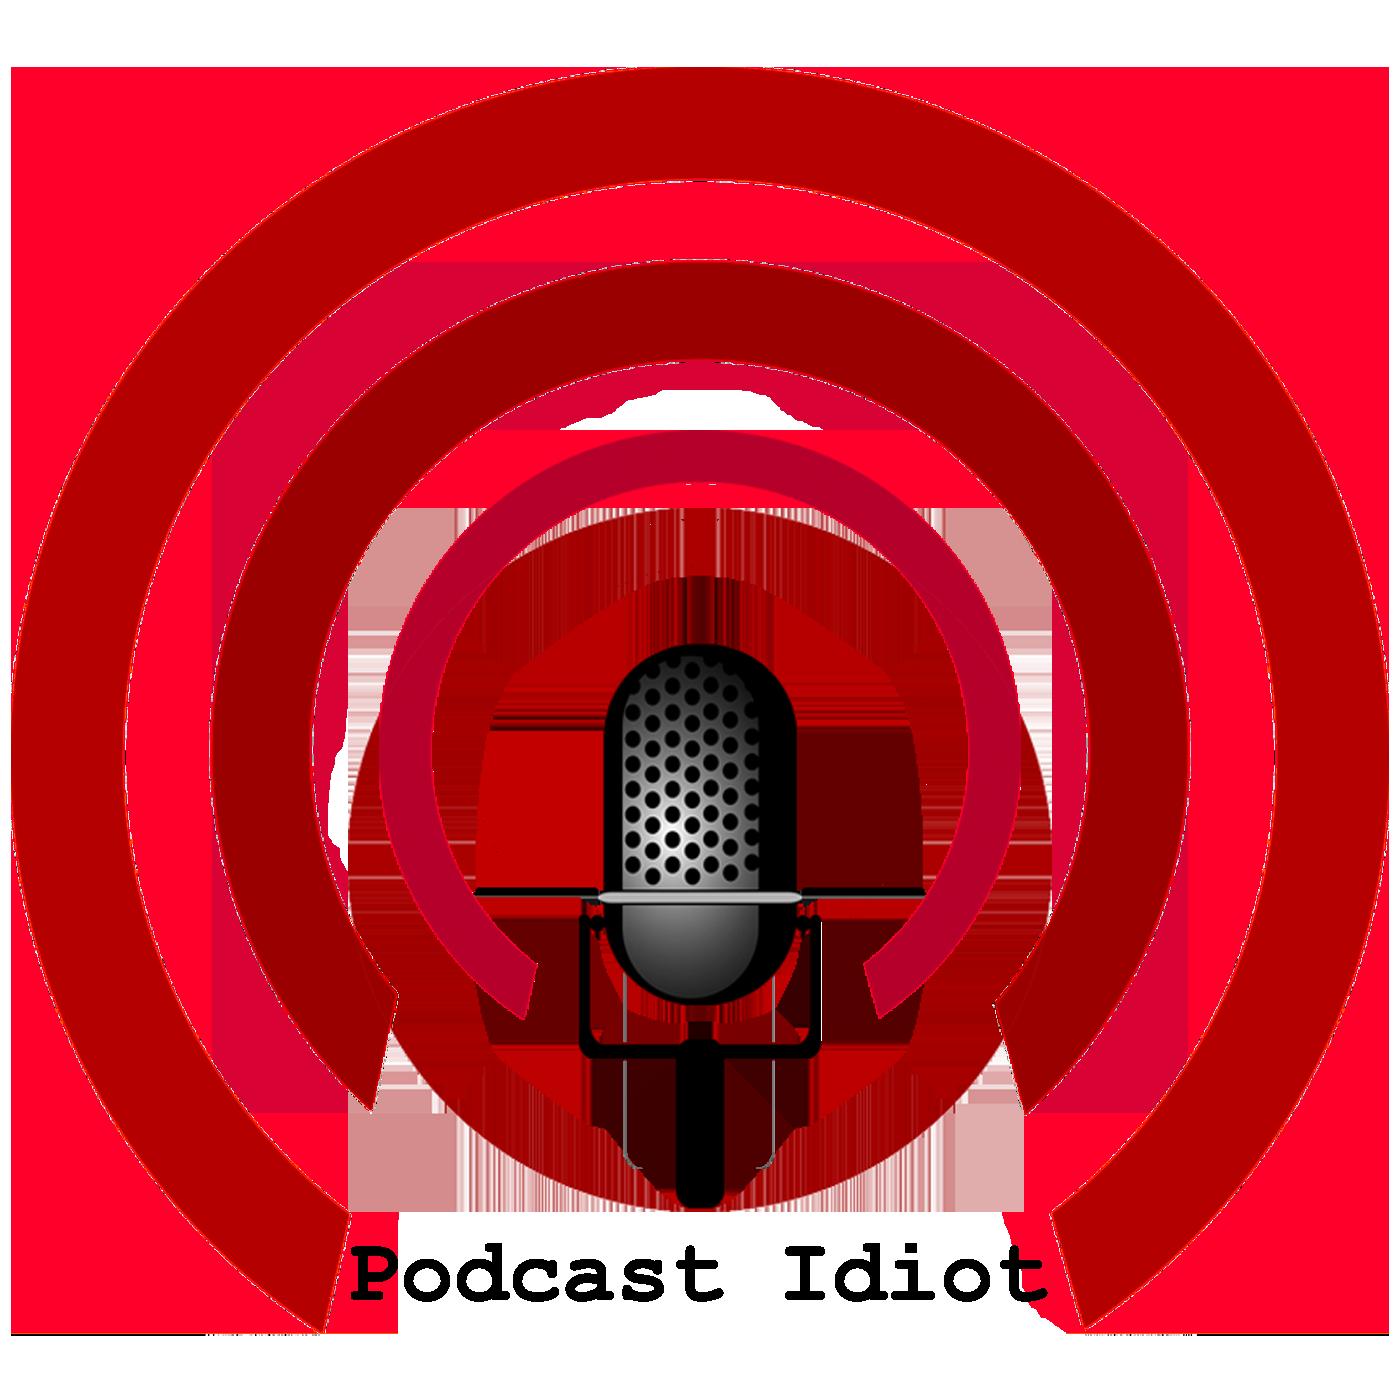 Podcast Idiot